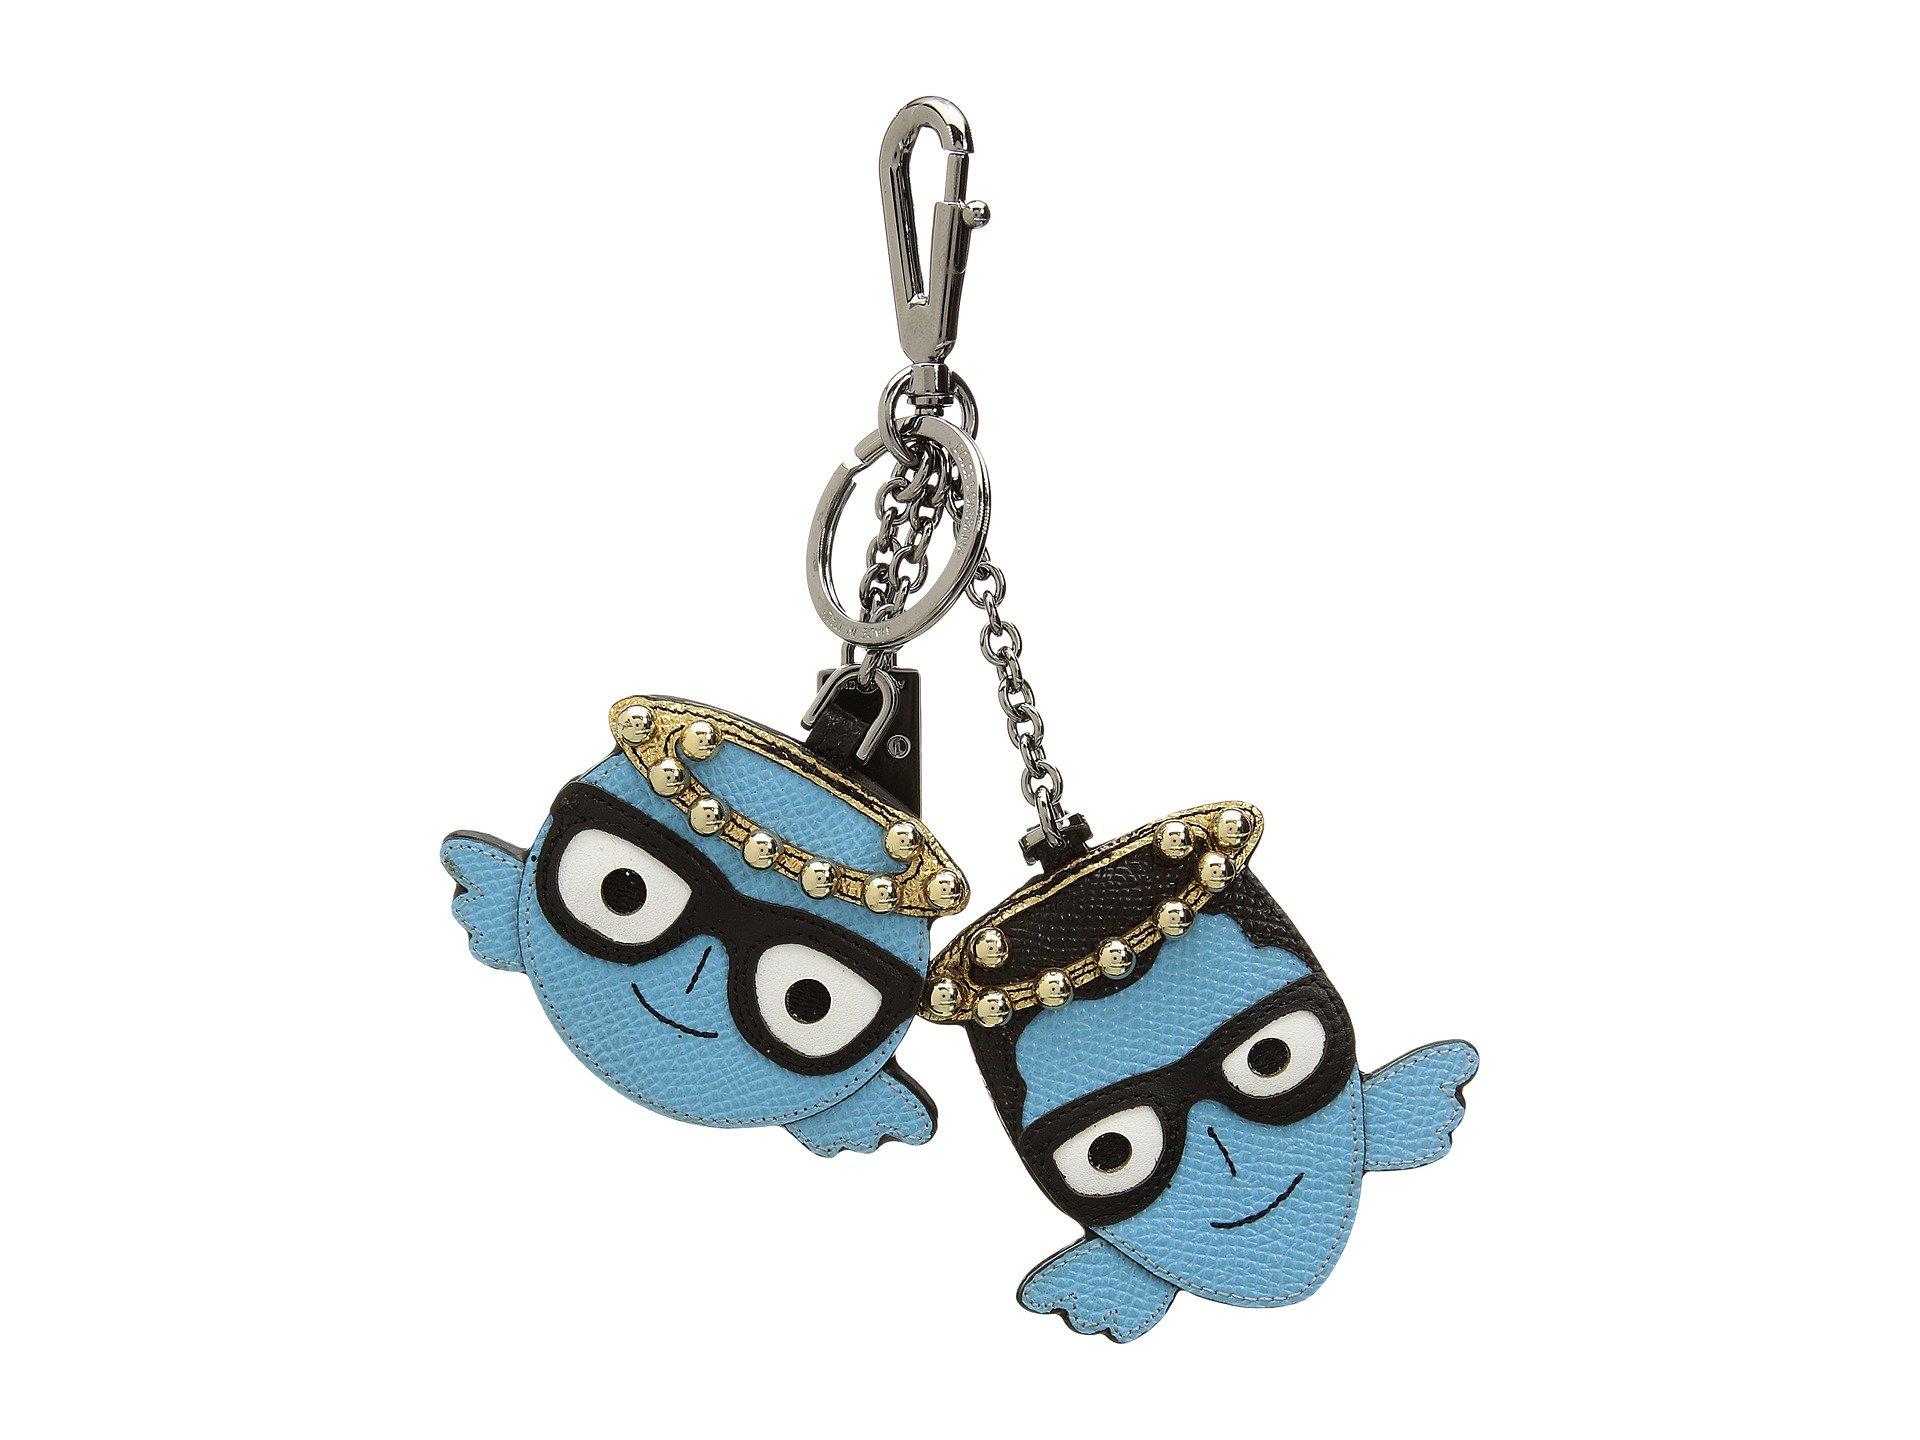 Billetera Clip para Hombre Dolce and Gabbana Angel Key Ring  + Dolce & Gabbana en VeoyCompro.net